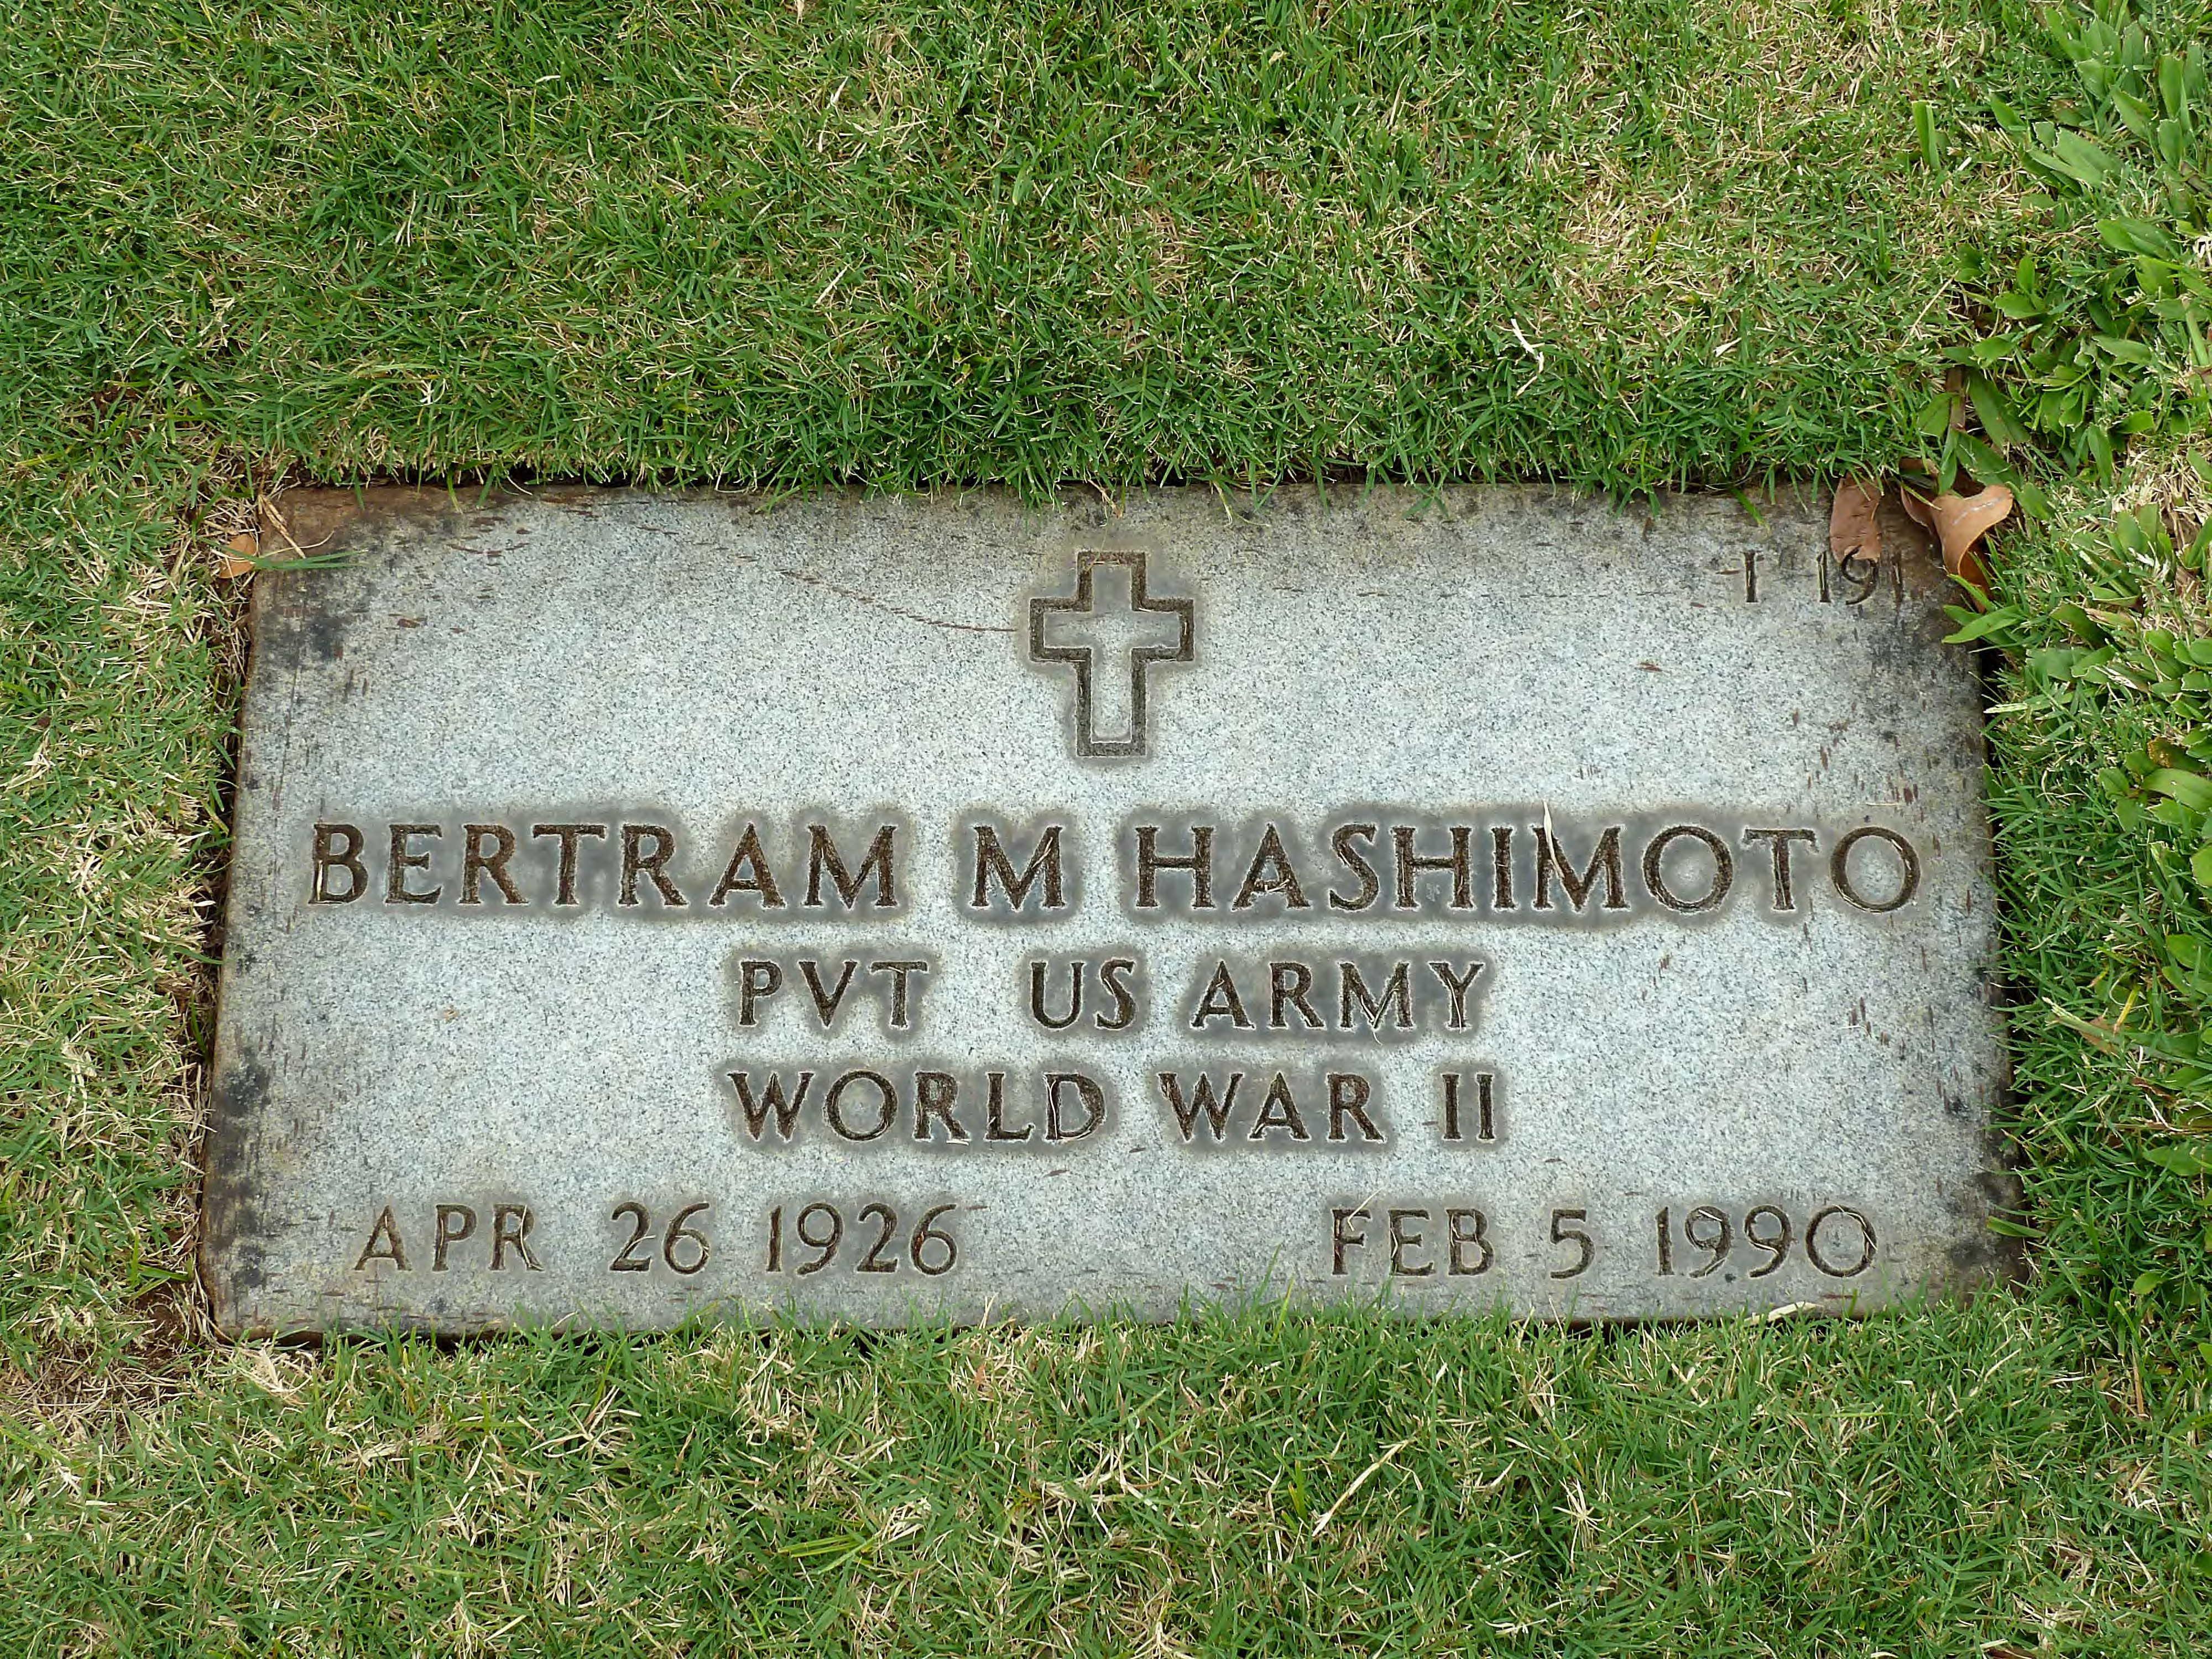 Bertram M Hashimoto